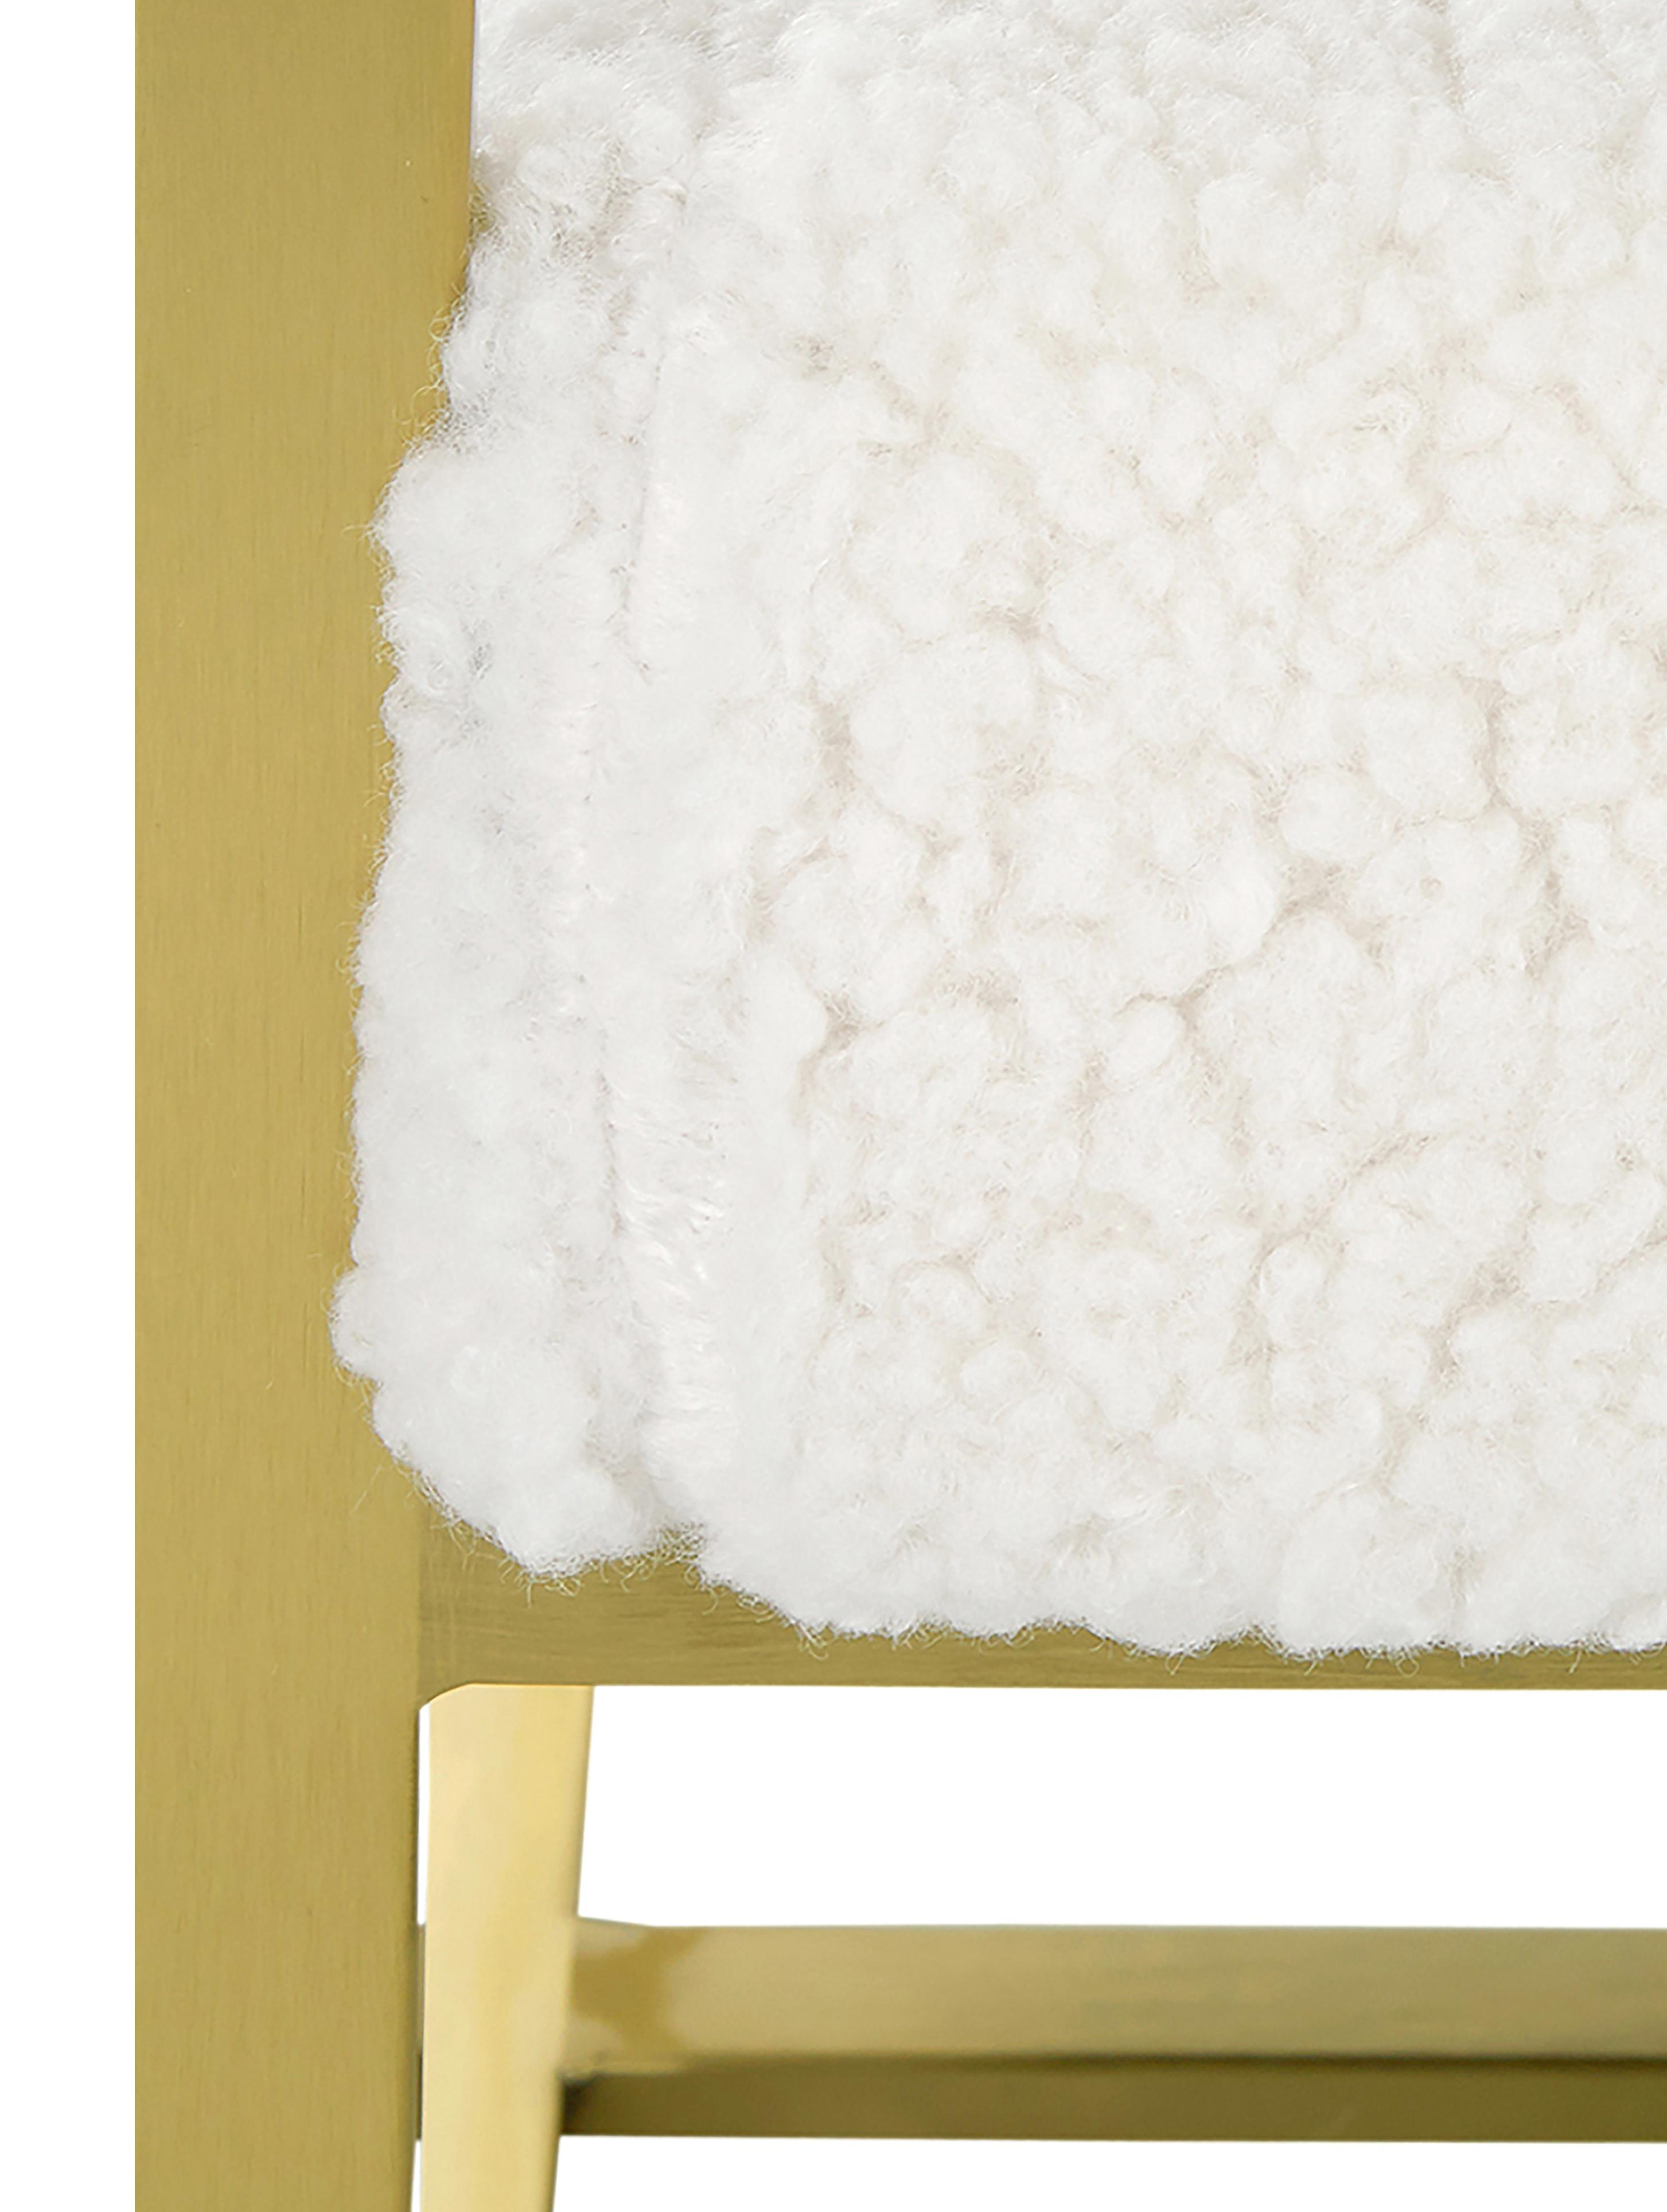 Teddy-Loungesessel Manhattan in Cremeweiß, Bezug: Polyester (Teddyfell), Gestell: Metall, beschichtet, Teddy Cremeweiß, B 70 x T 72 cm